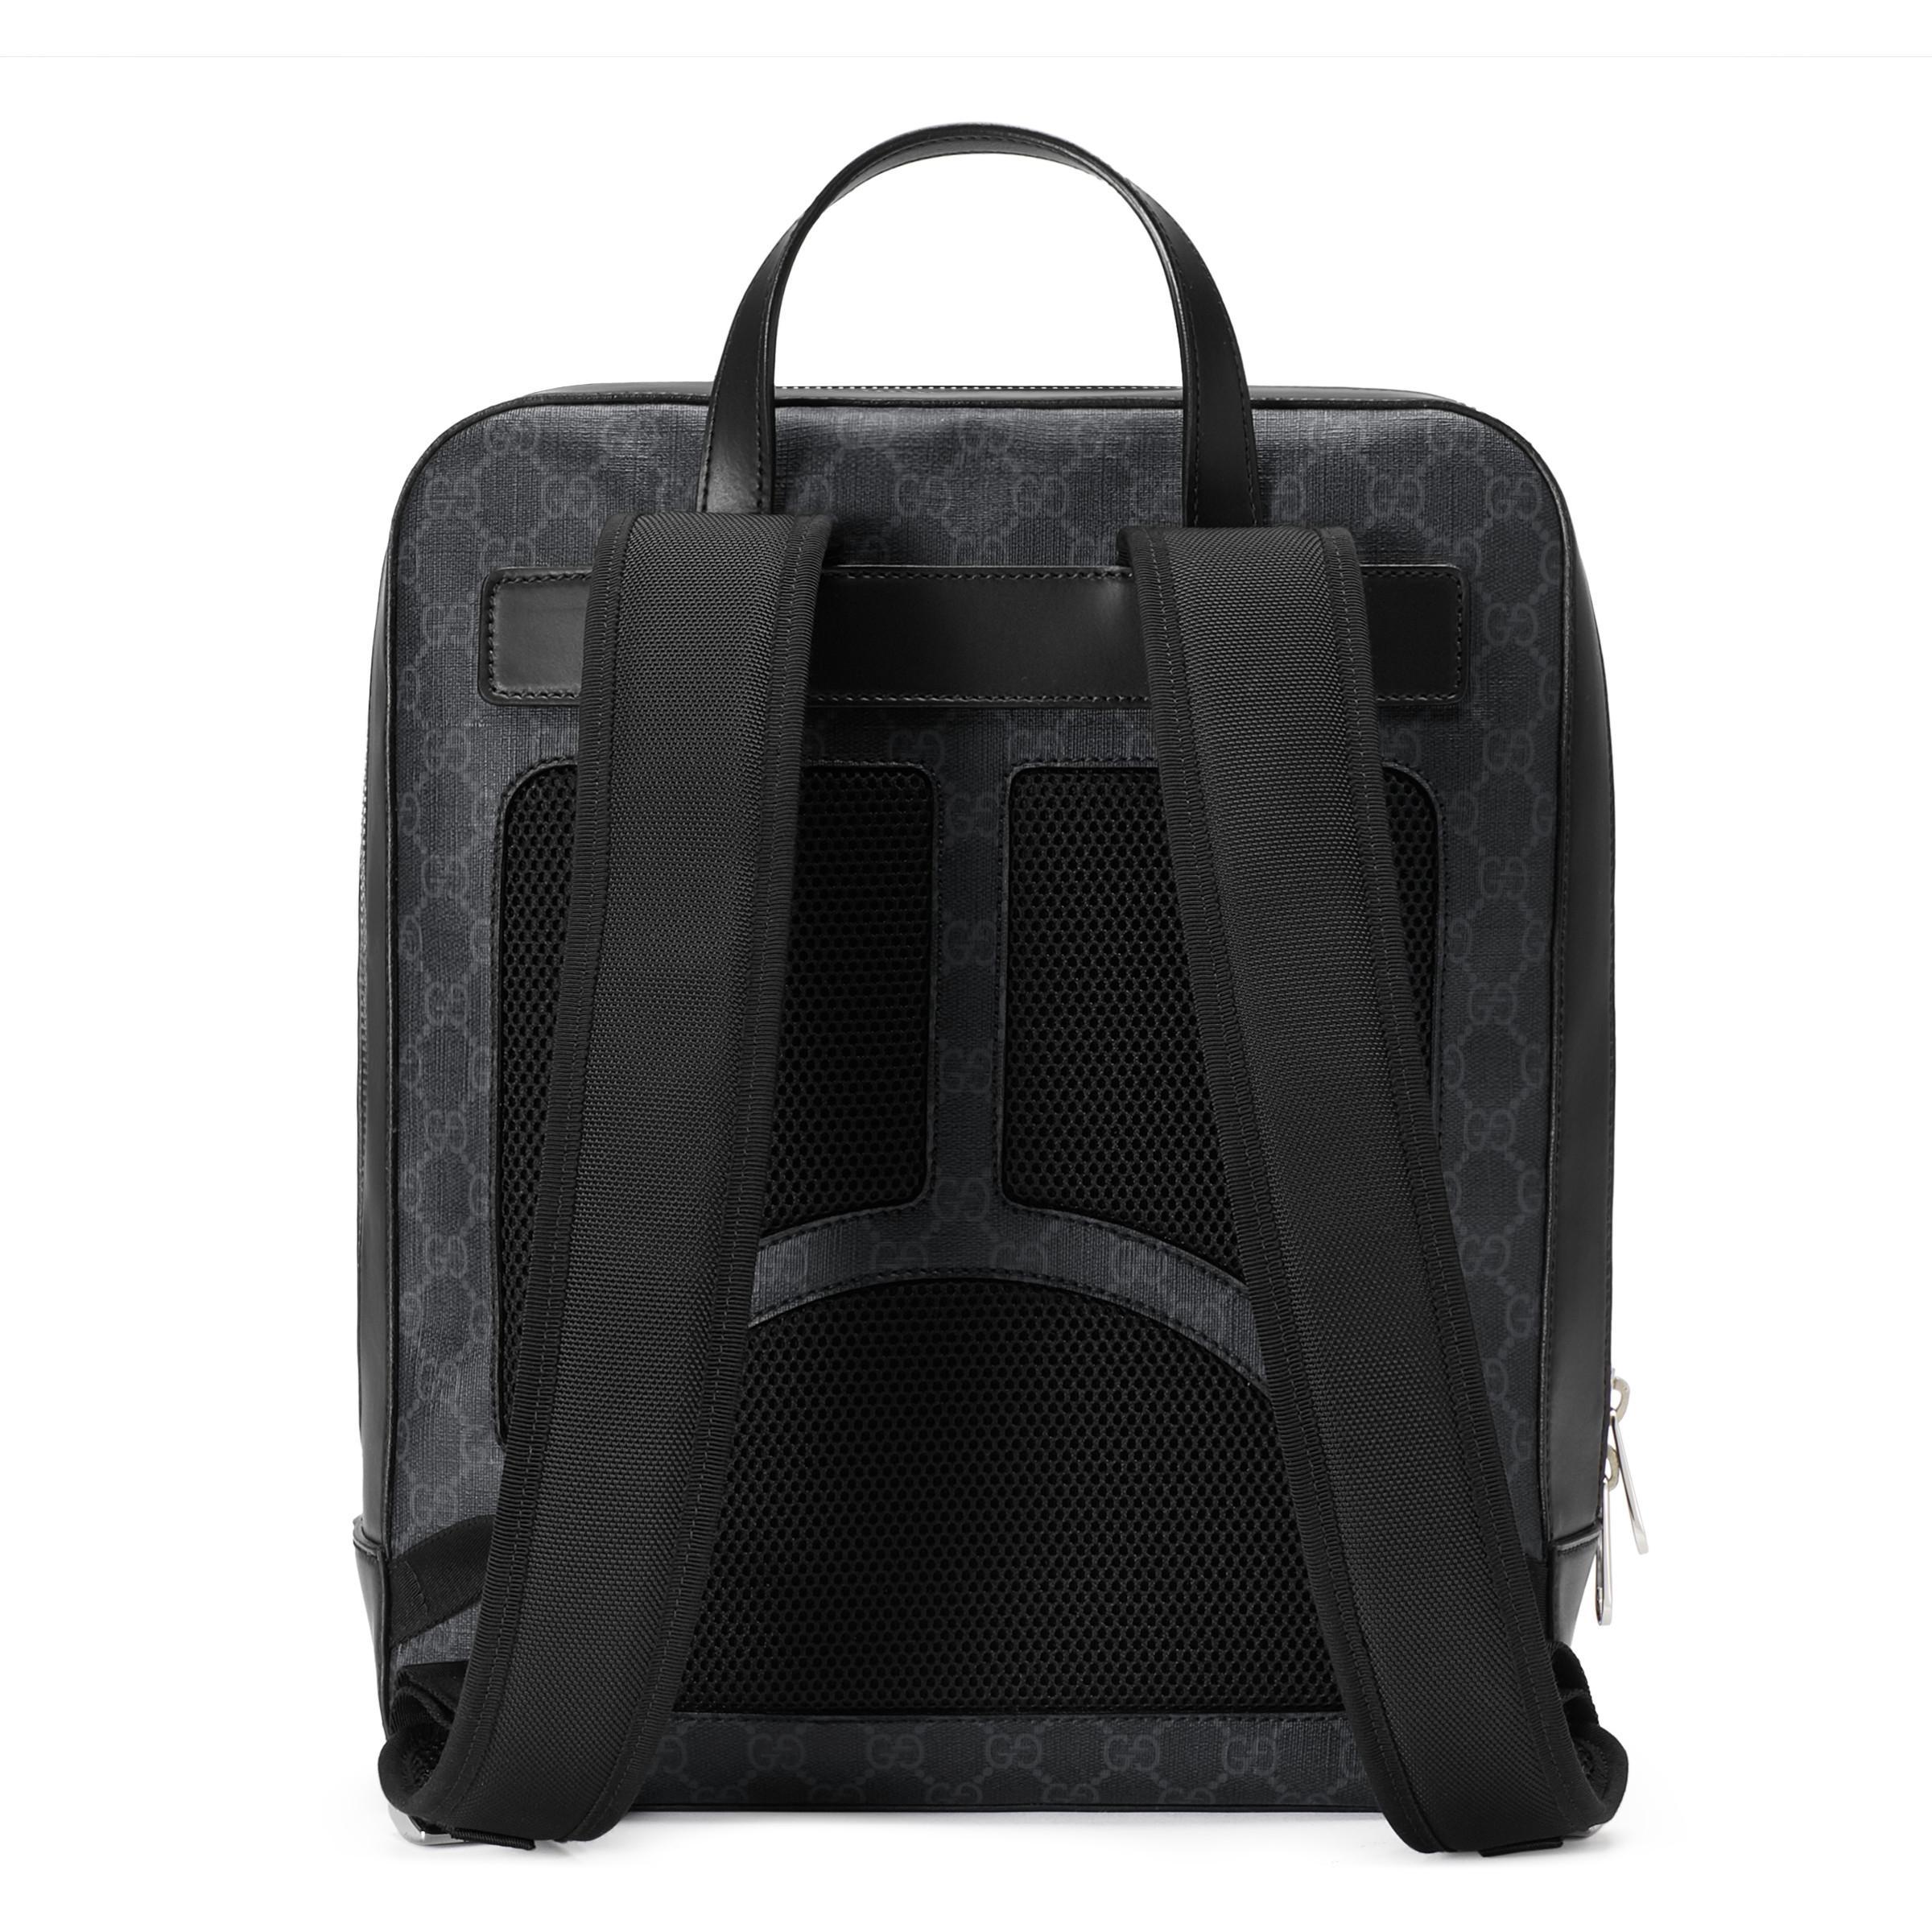 9d64dc2ff94 Gucci - Black Gg Supreme Canvas Backpack for Men - Lyst. View fullscreen